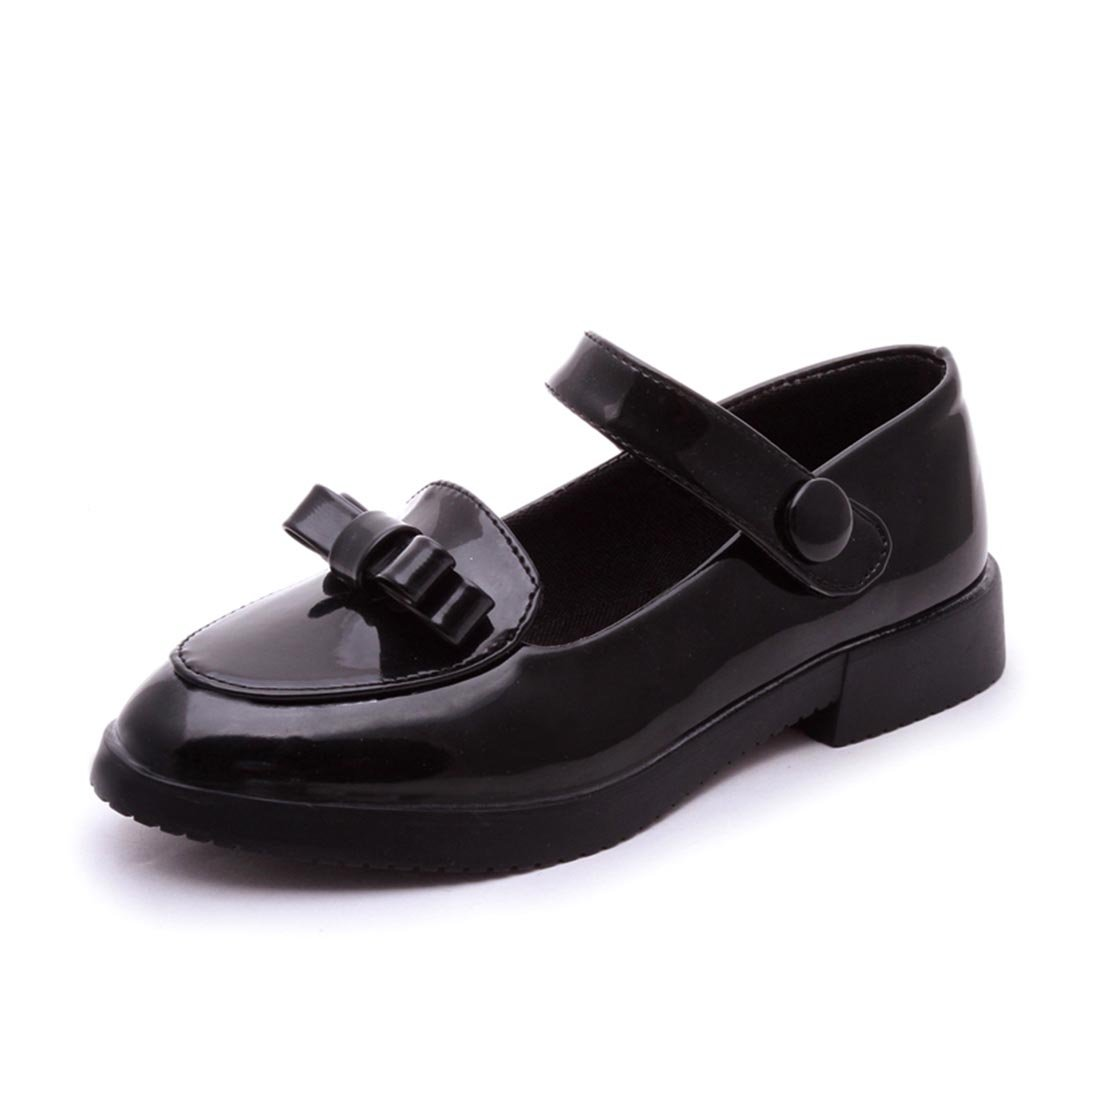 YIBLBOX Girls Children Bowknot Mary Jane Ballet Flats Princess Bridesmaid Wedding Party School Shoes